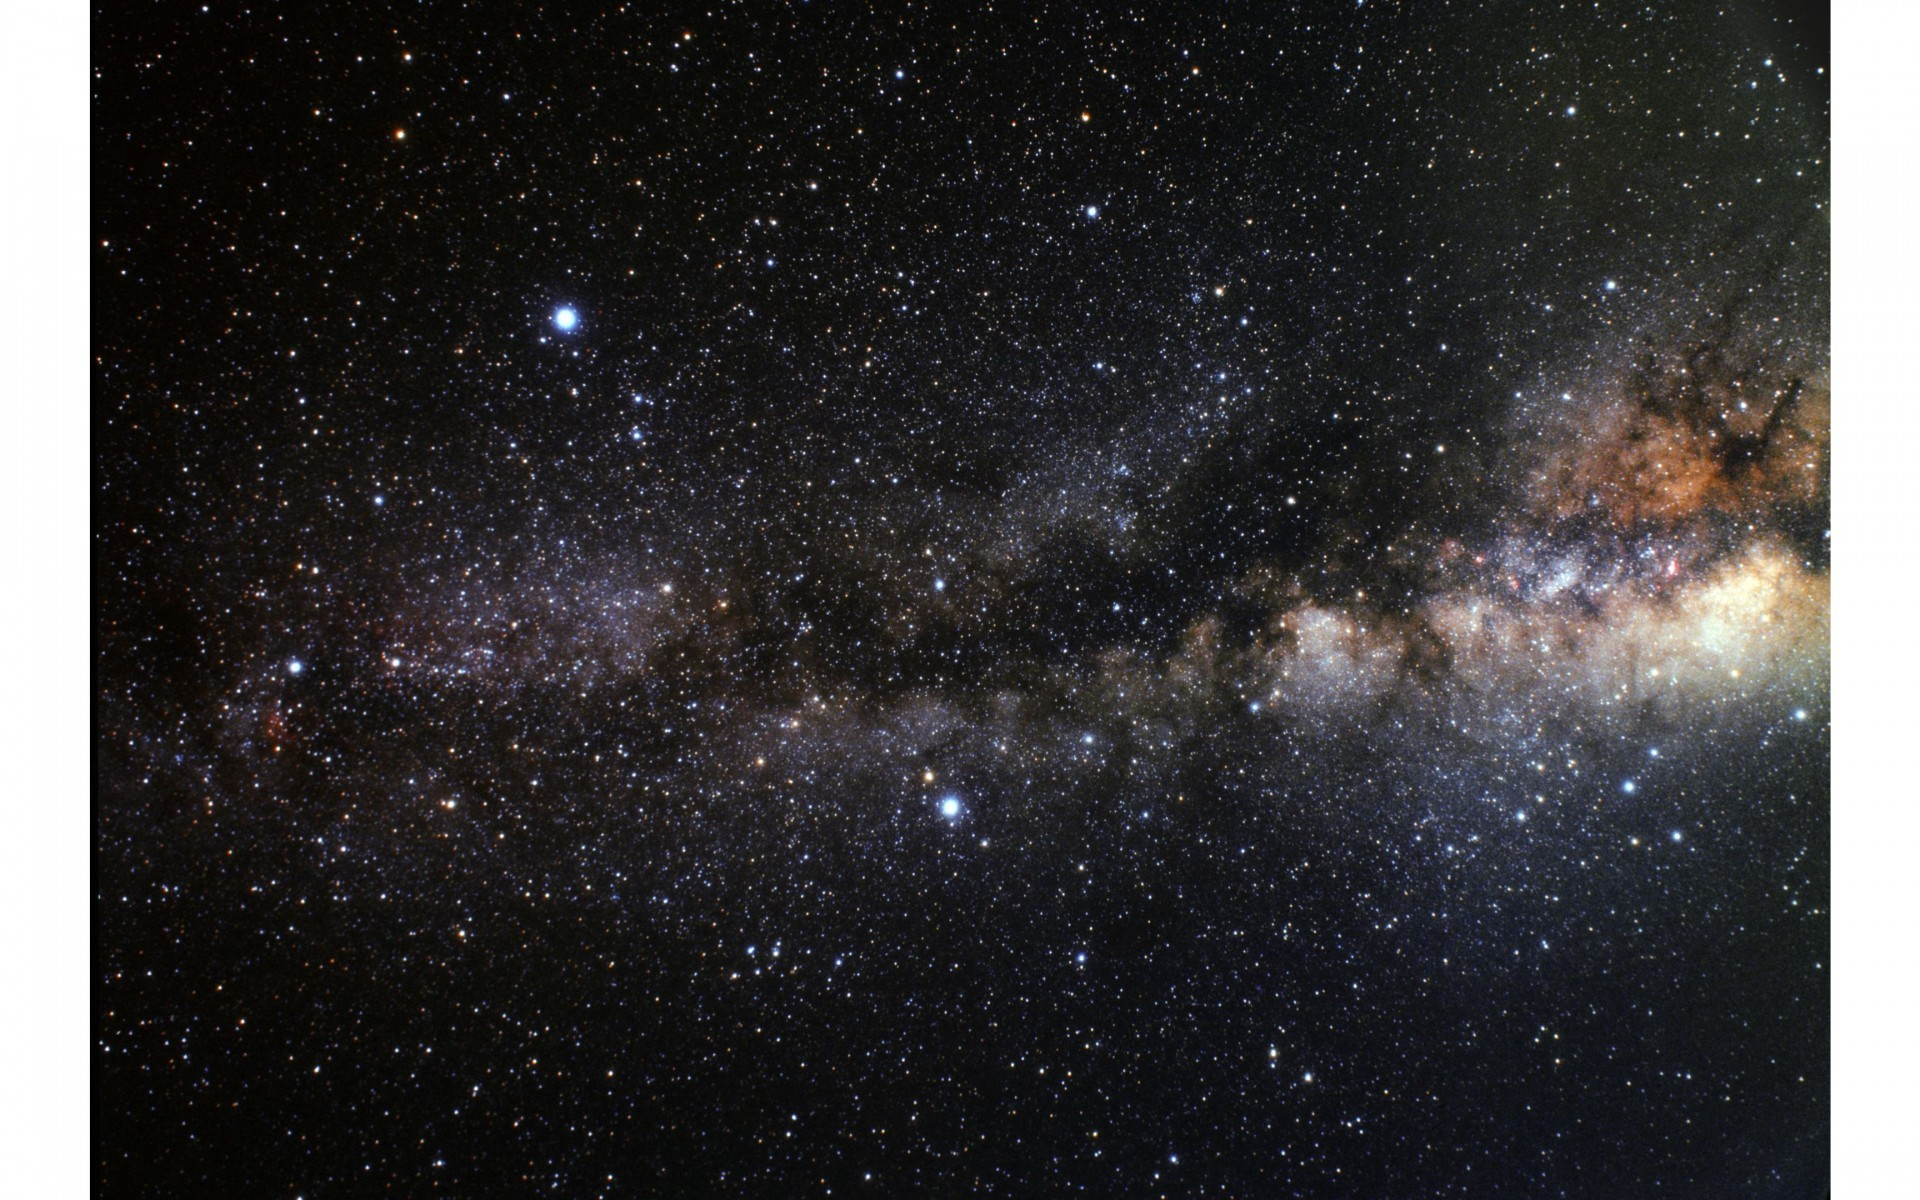 Space 4K Wallpaper | Free 4K Wallpaper